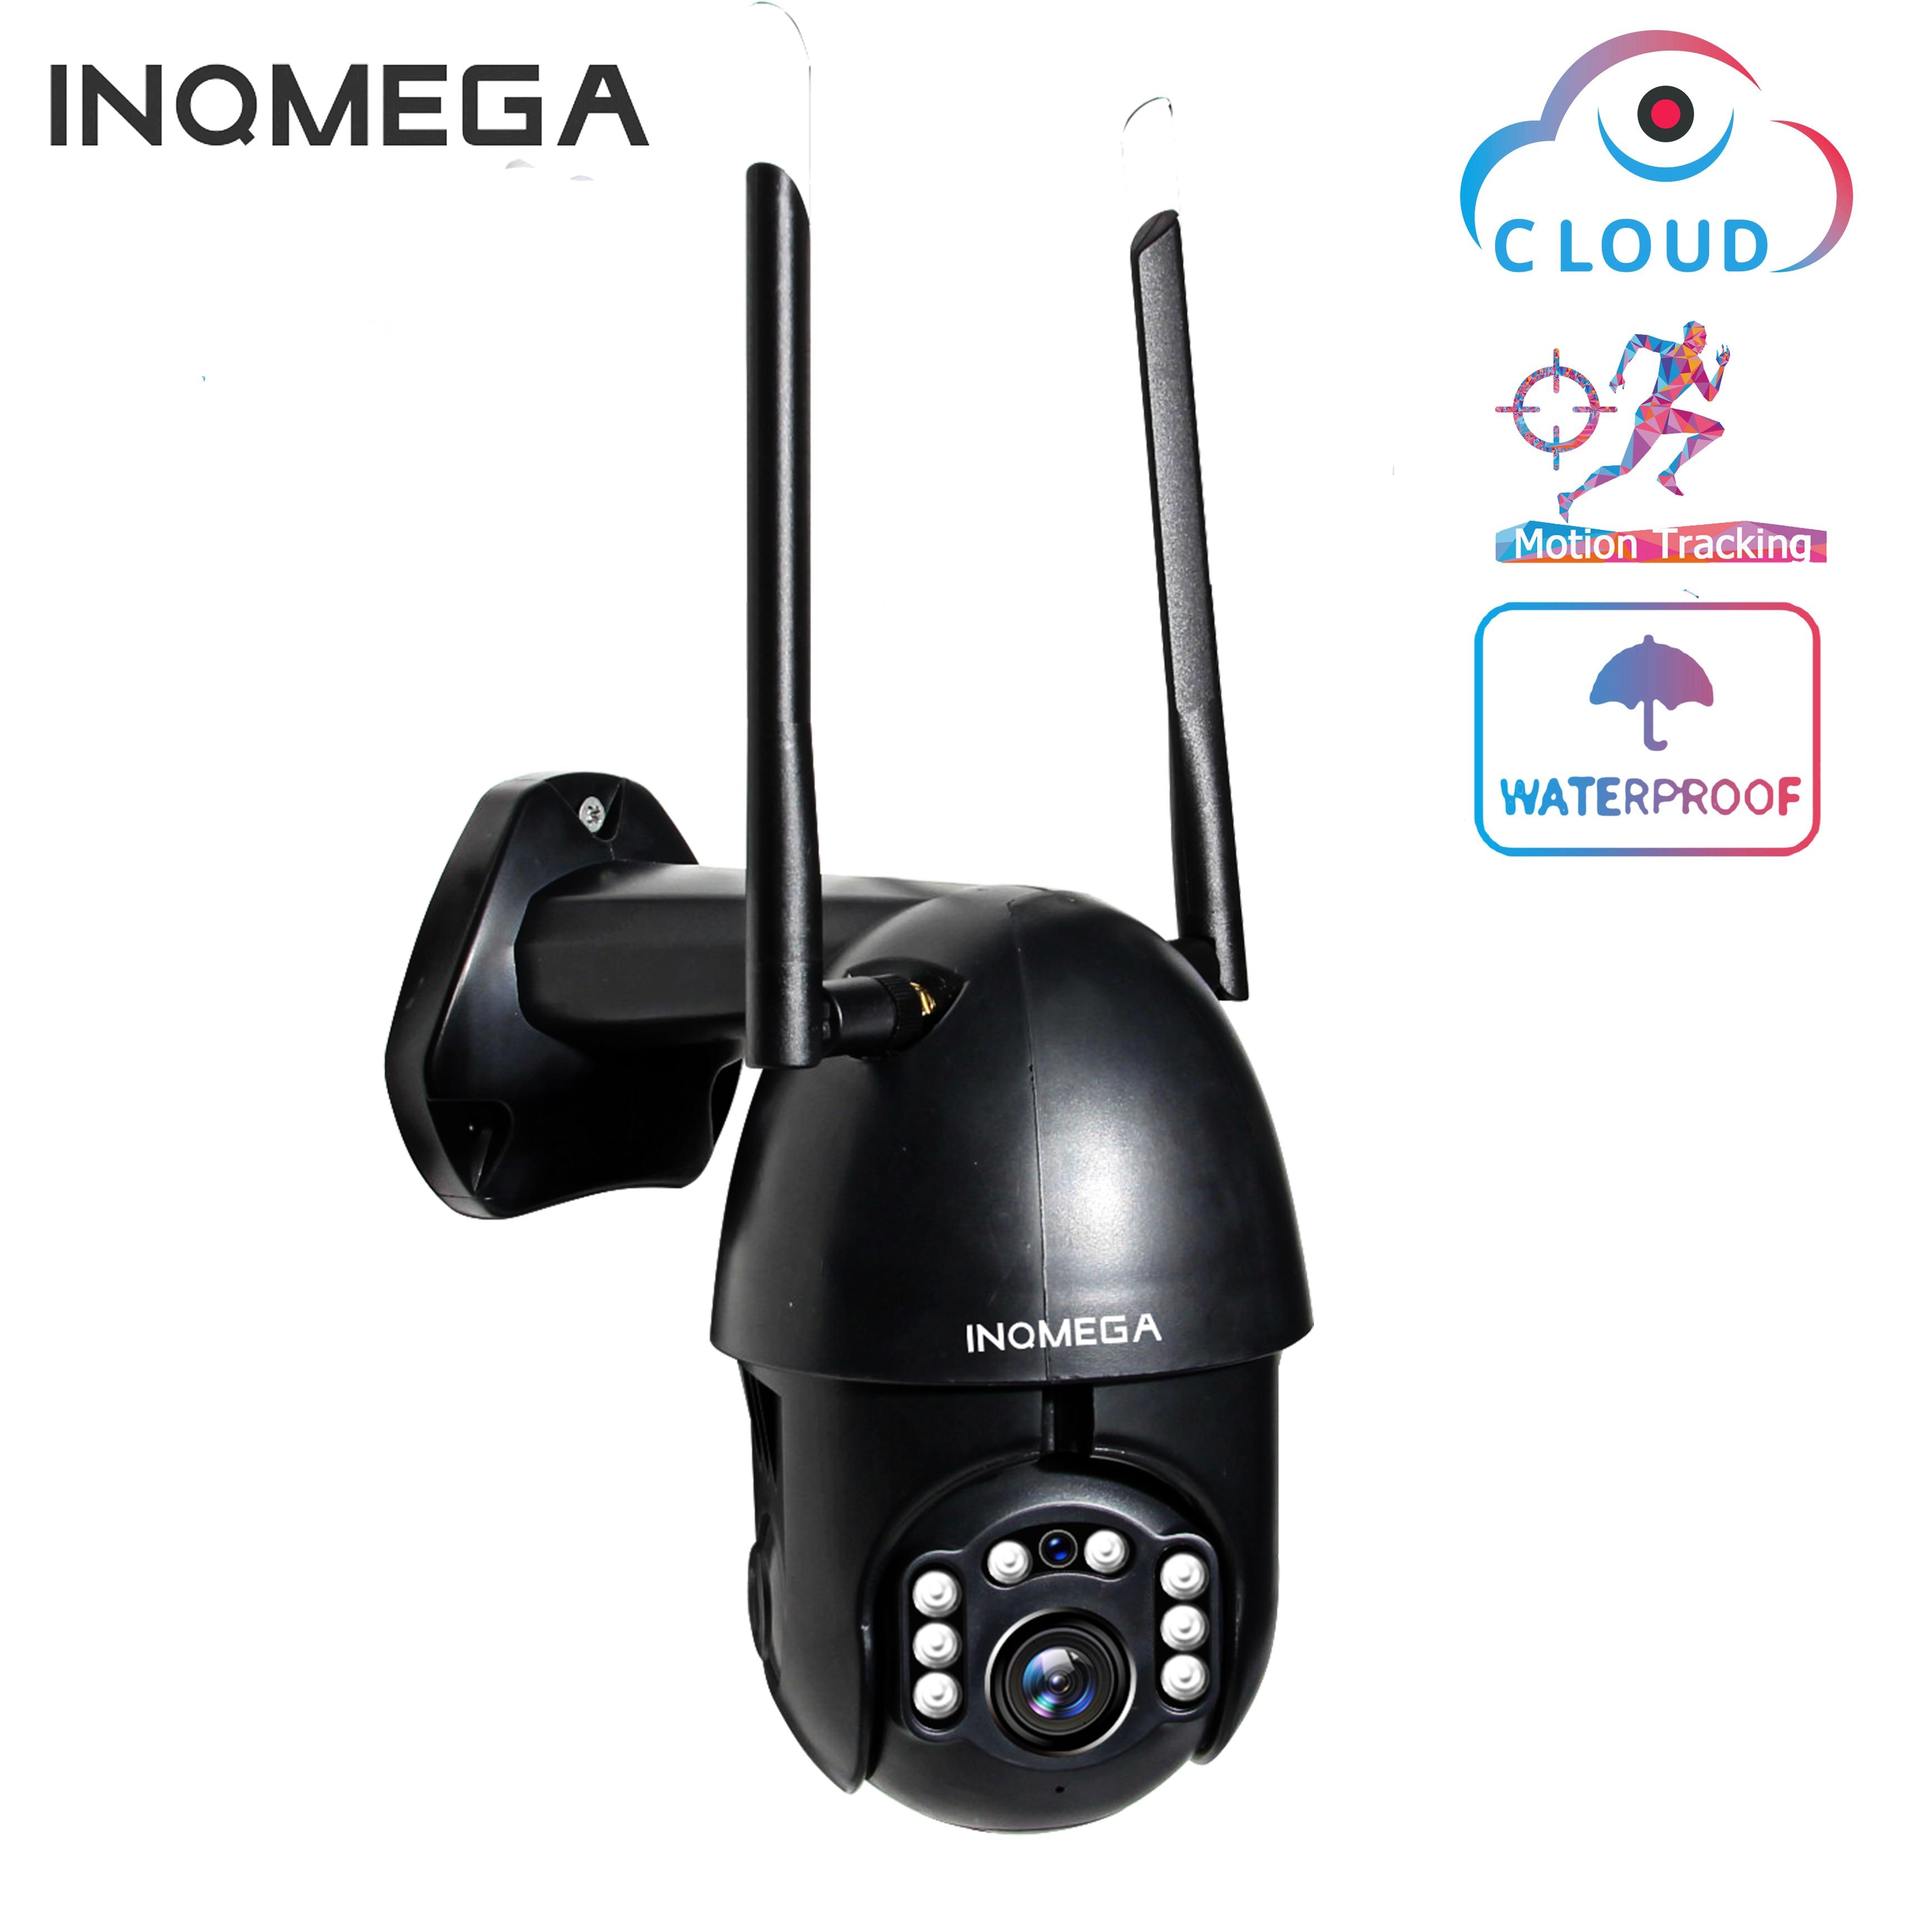 INQMEGA WiFi  1080P IP Camera  Wireless Auto Tracking PTZ Speed Dome Camera Outdoor CCTV Security Surveillance Waterproof Camera